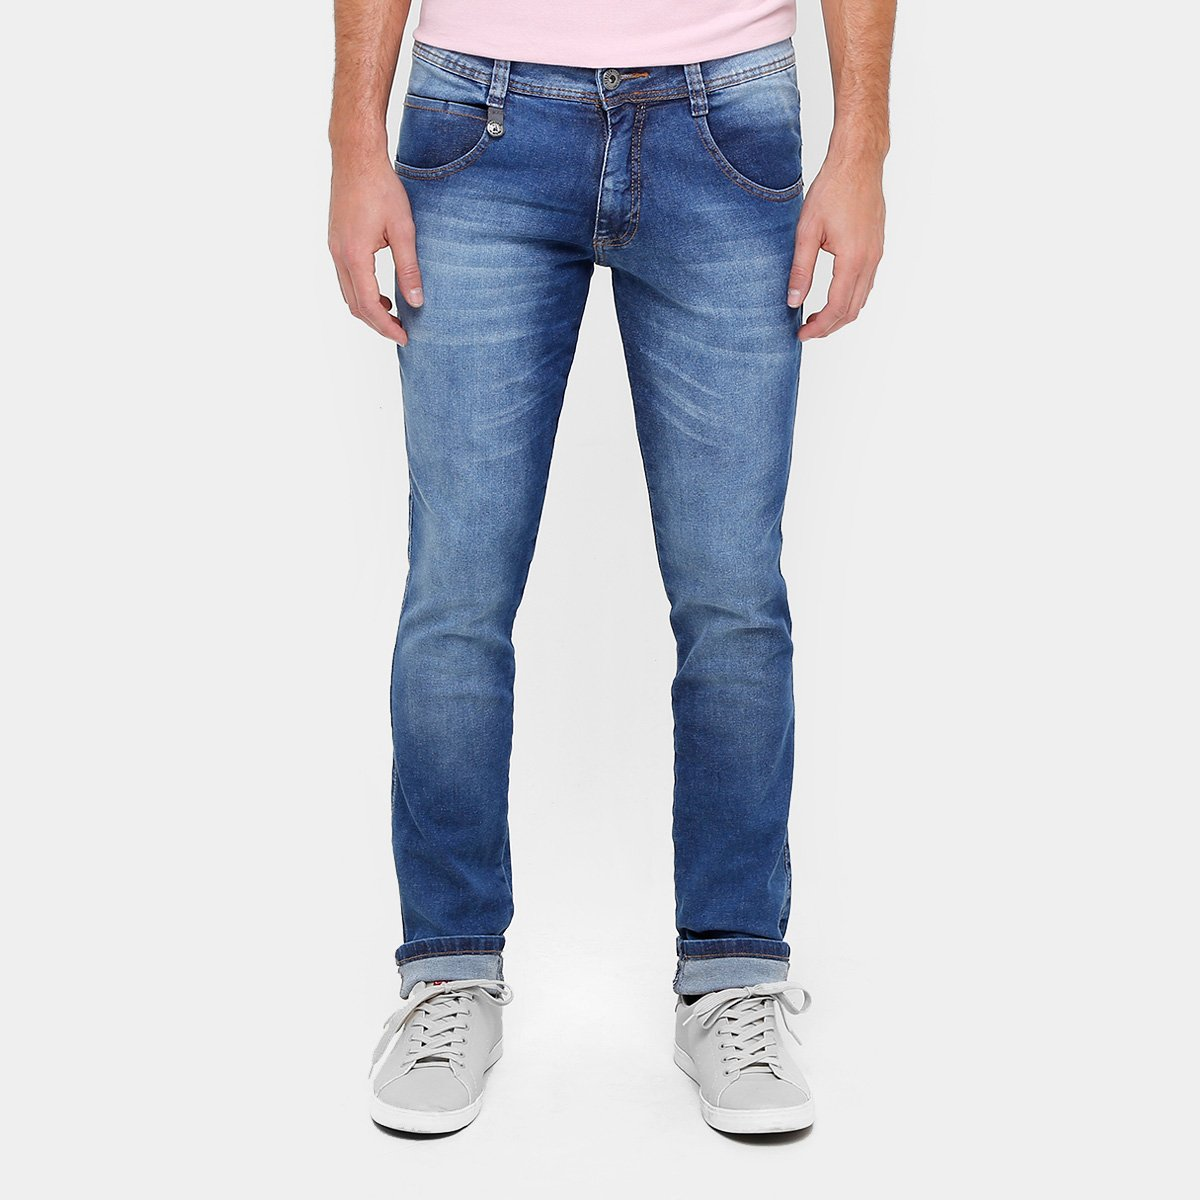 Calça Jeans Skinny Biotipo Estonada Elastano Masculino - Compre ... d7440a4520c